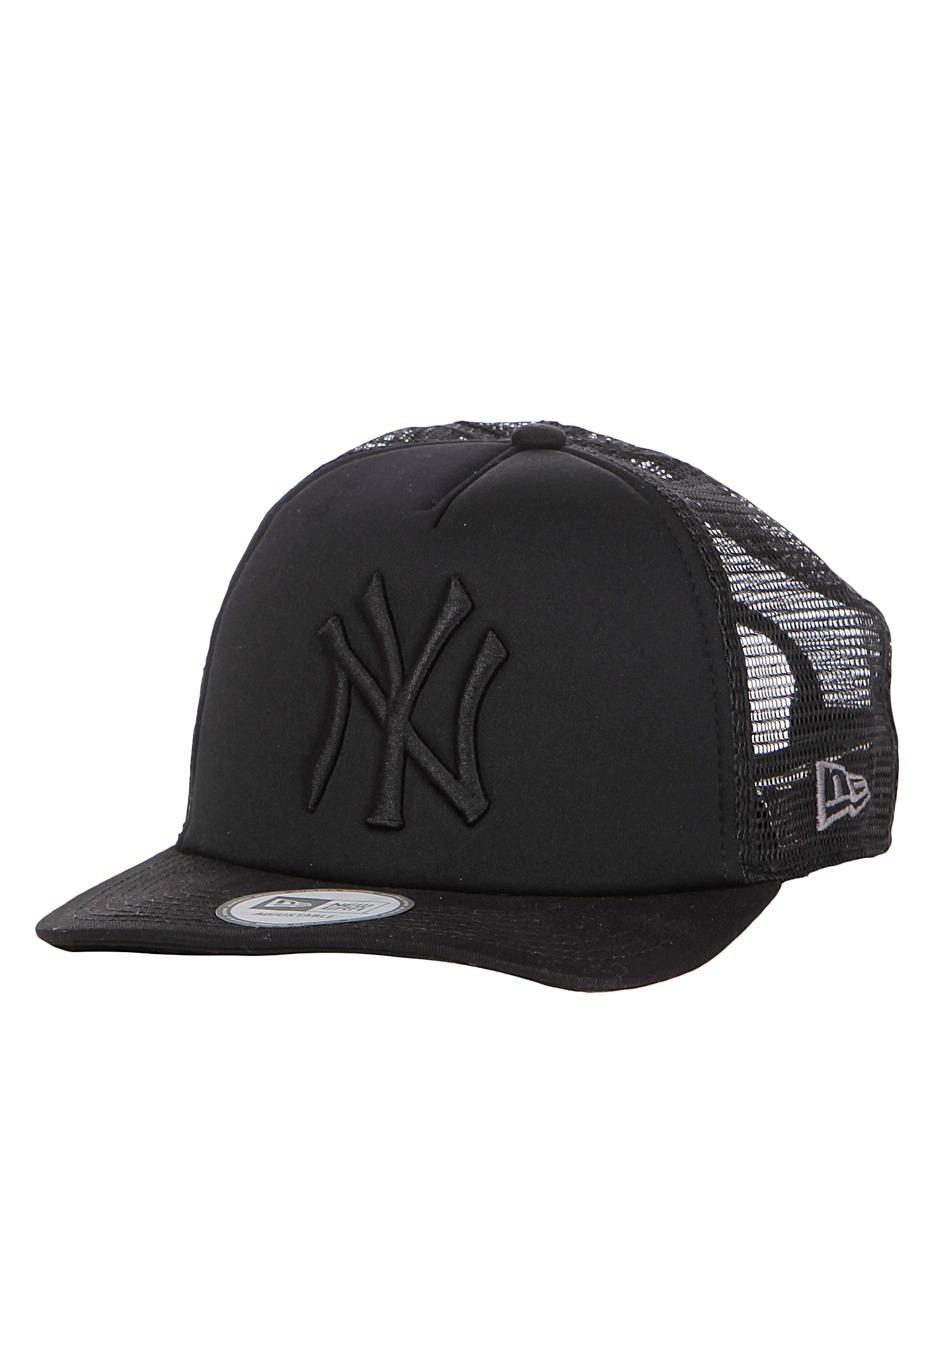 New Era - Tonal Clean 2 New York Yankees - Trucker Cap - Streetwear Shop -  Impericon.com Worldwide 7987eca2b9b